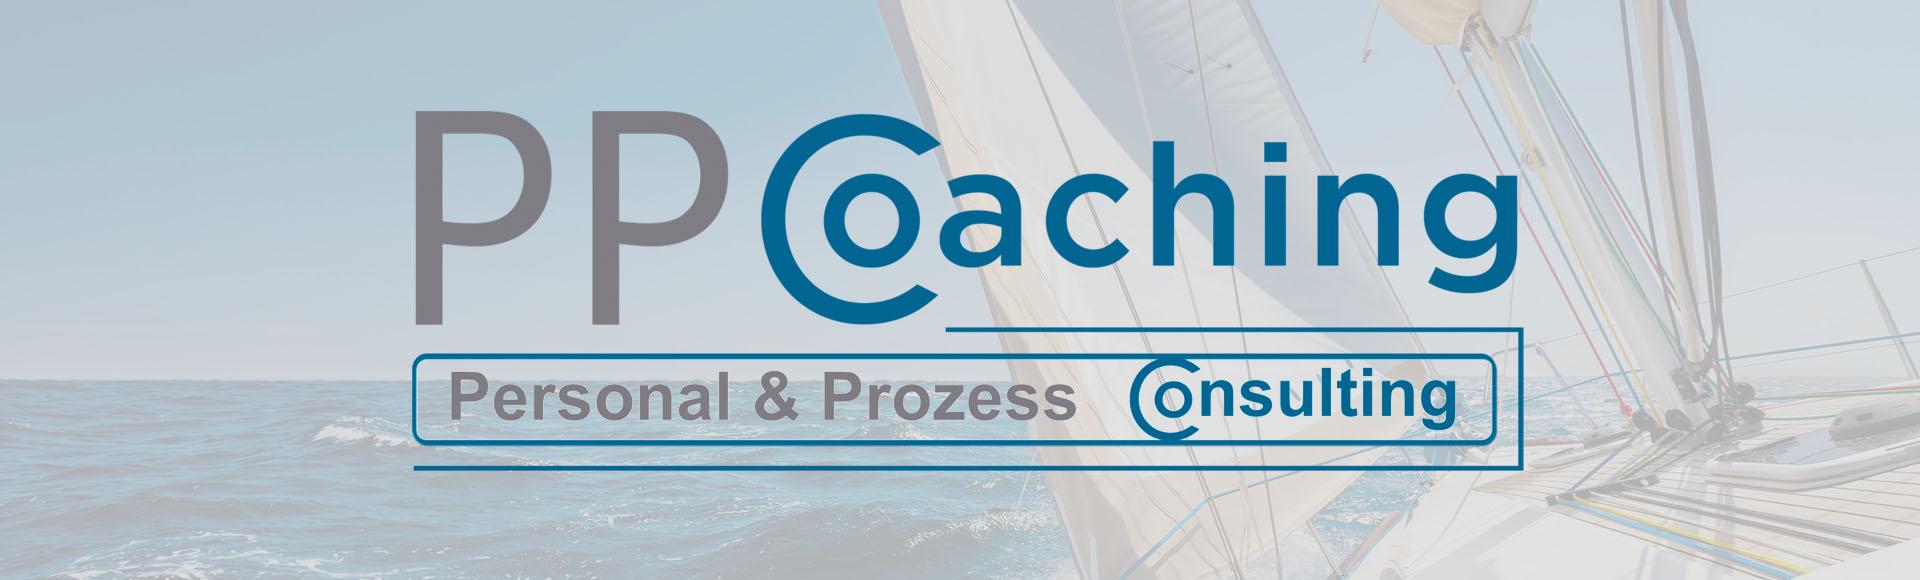 pp-coaching-Management